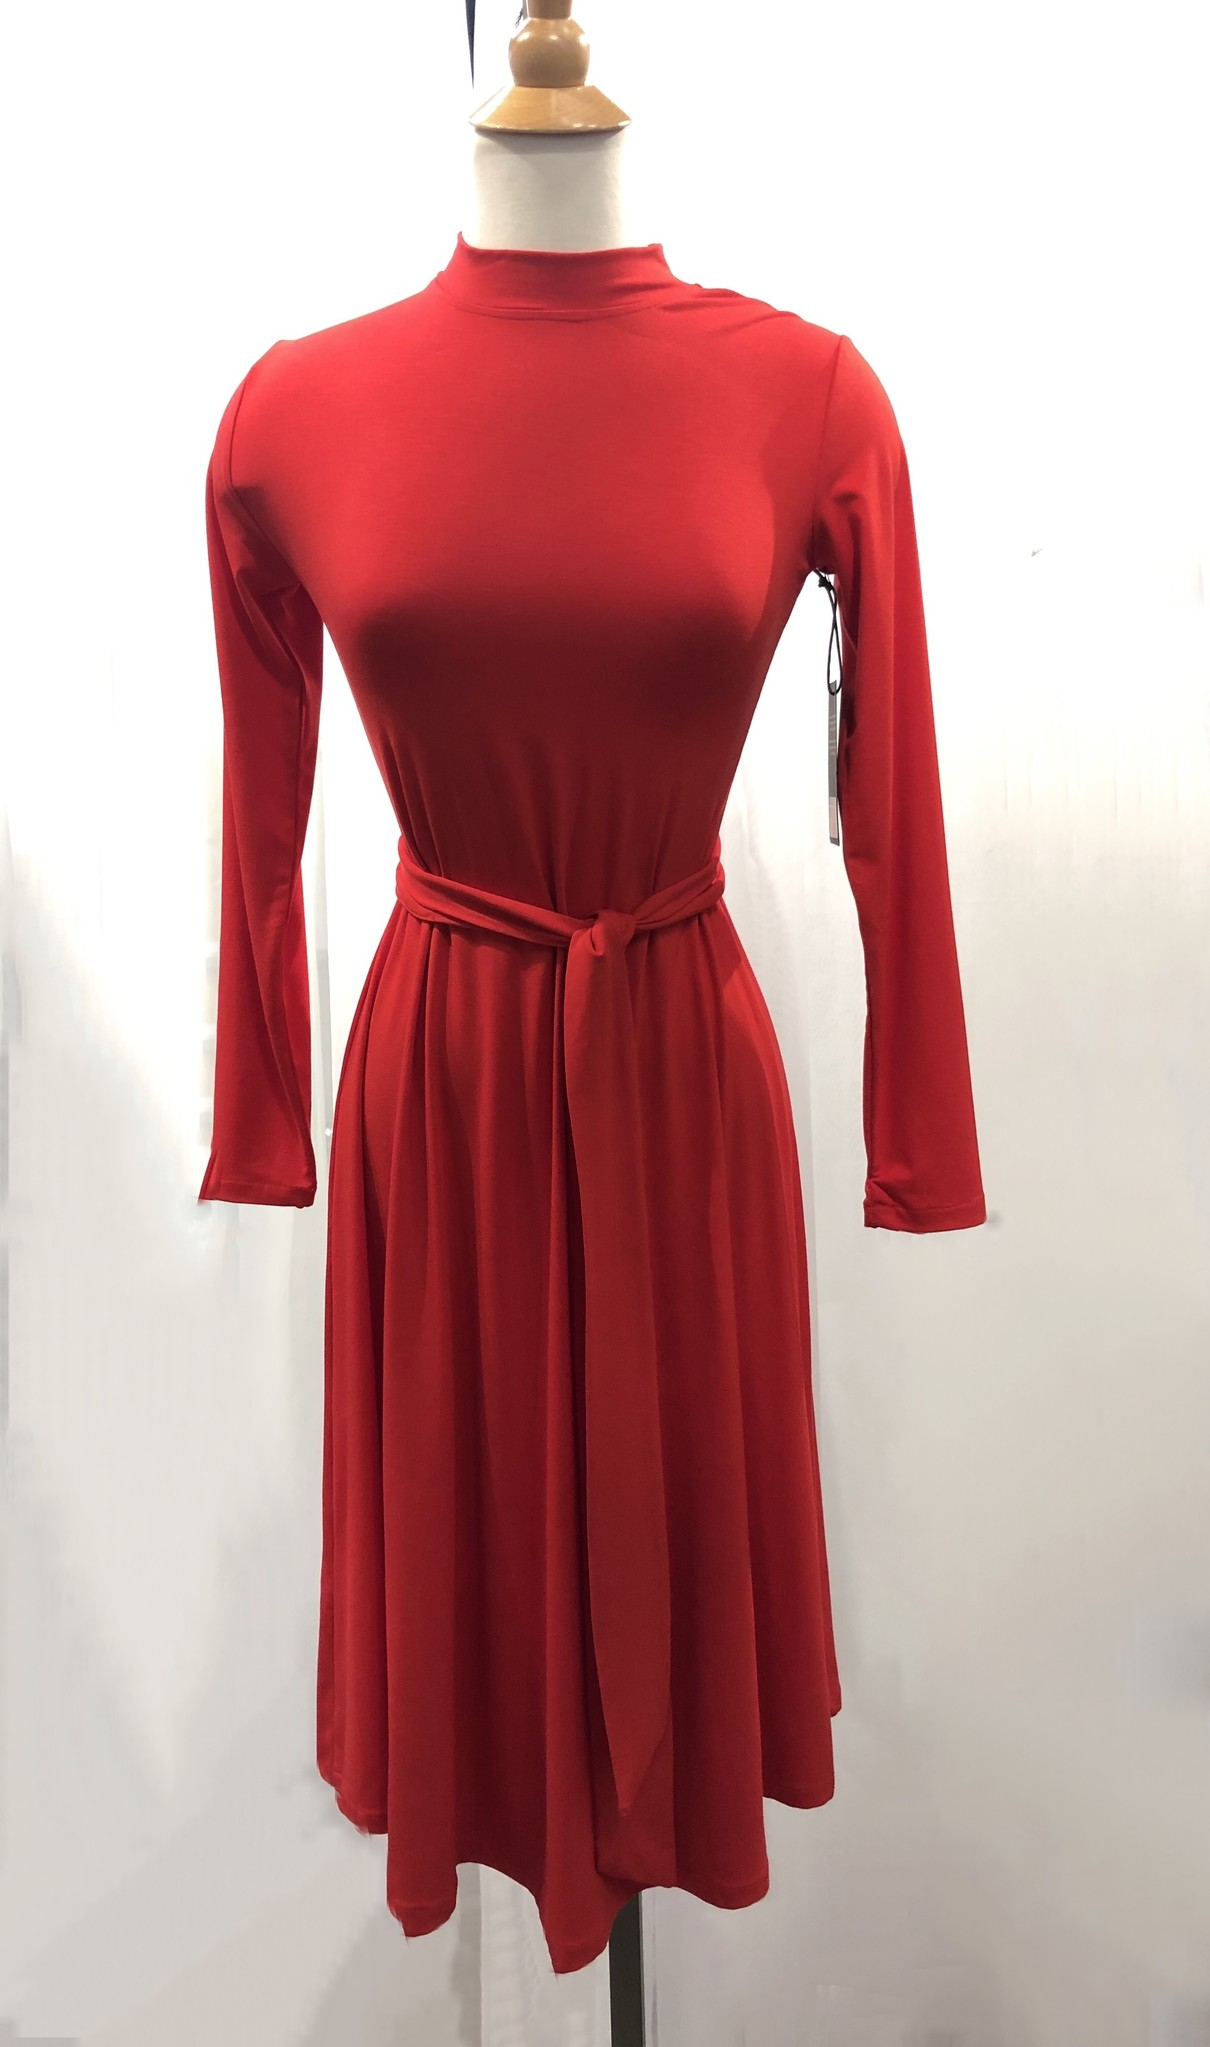 Sooley Designs Mock Neck Betty Dress - Bamboo